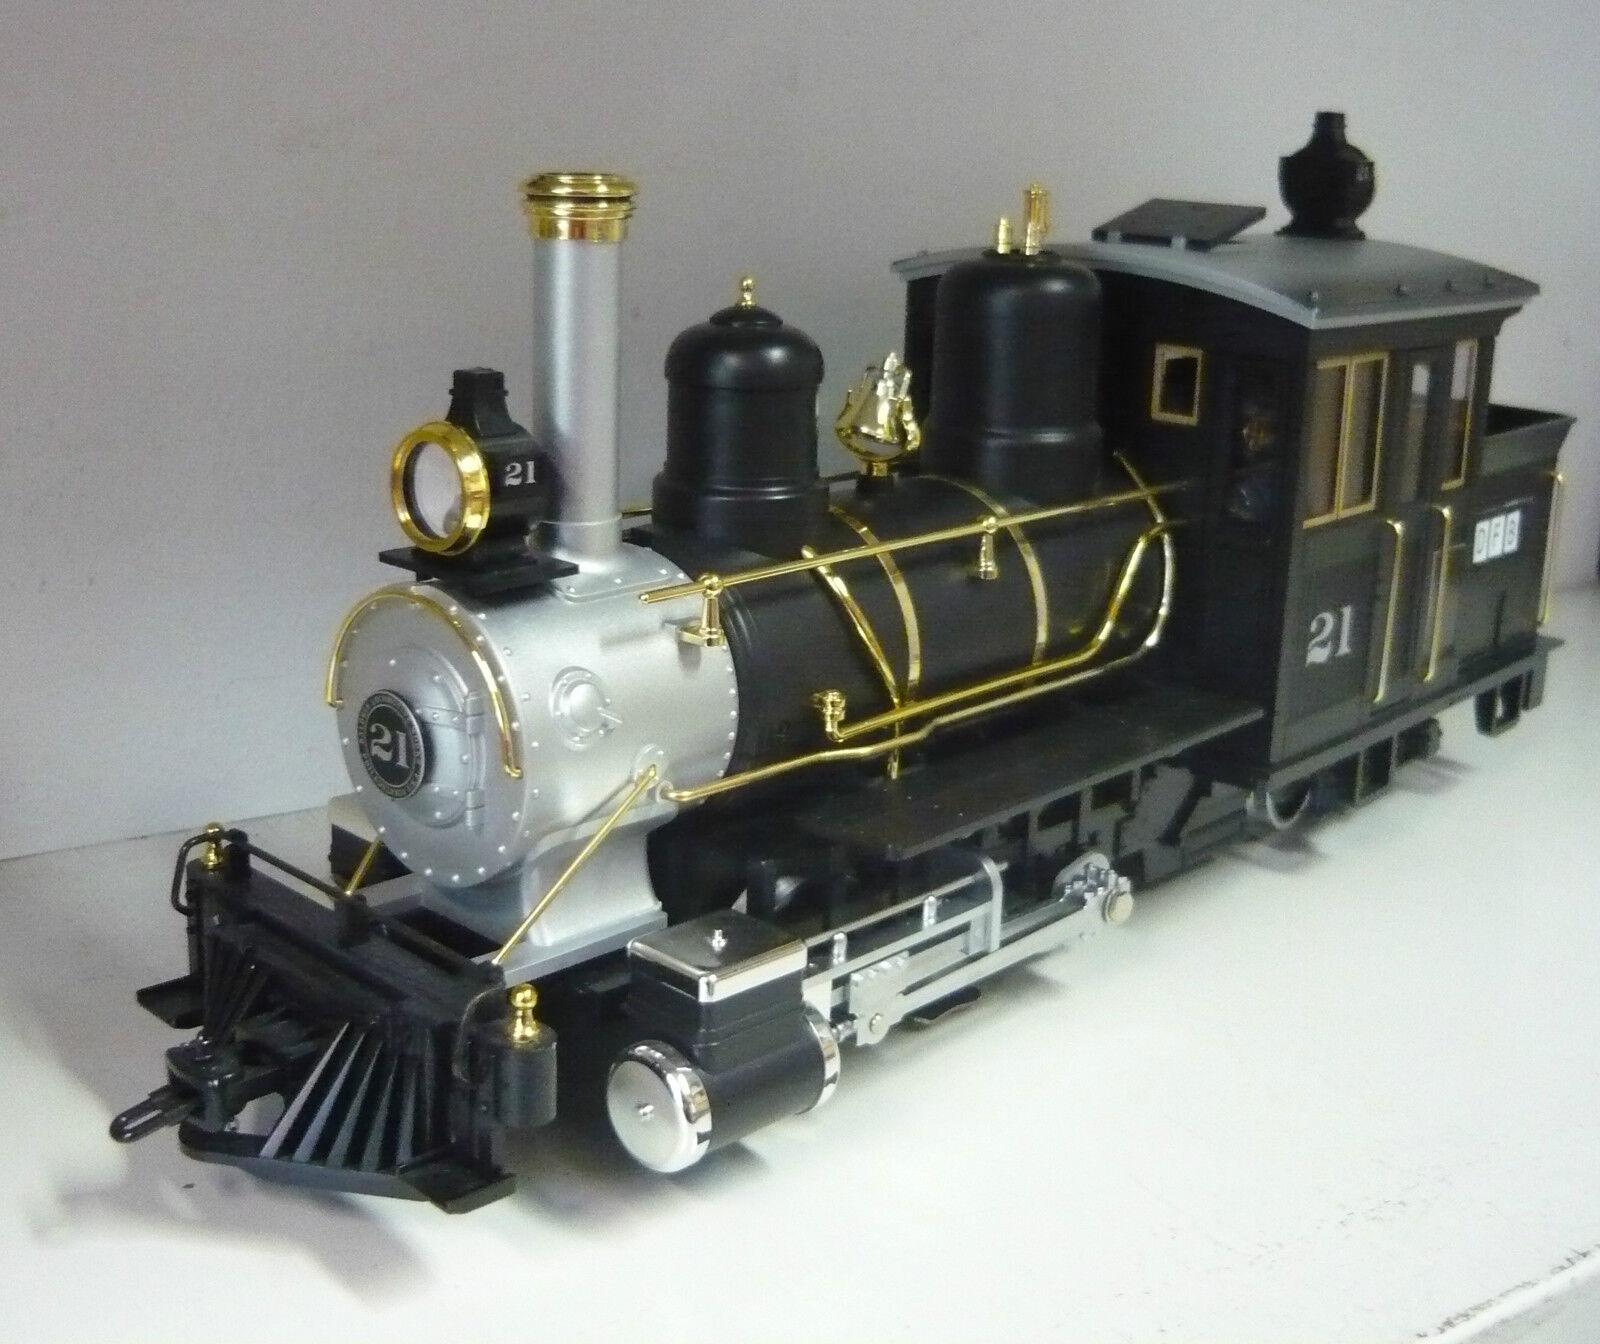 LGB 21251 máquina de vapor tipo 0-4-4 Forney, pista G, usado, sin OVP, limitado